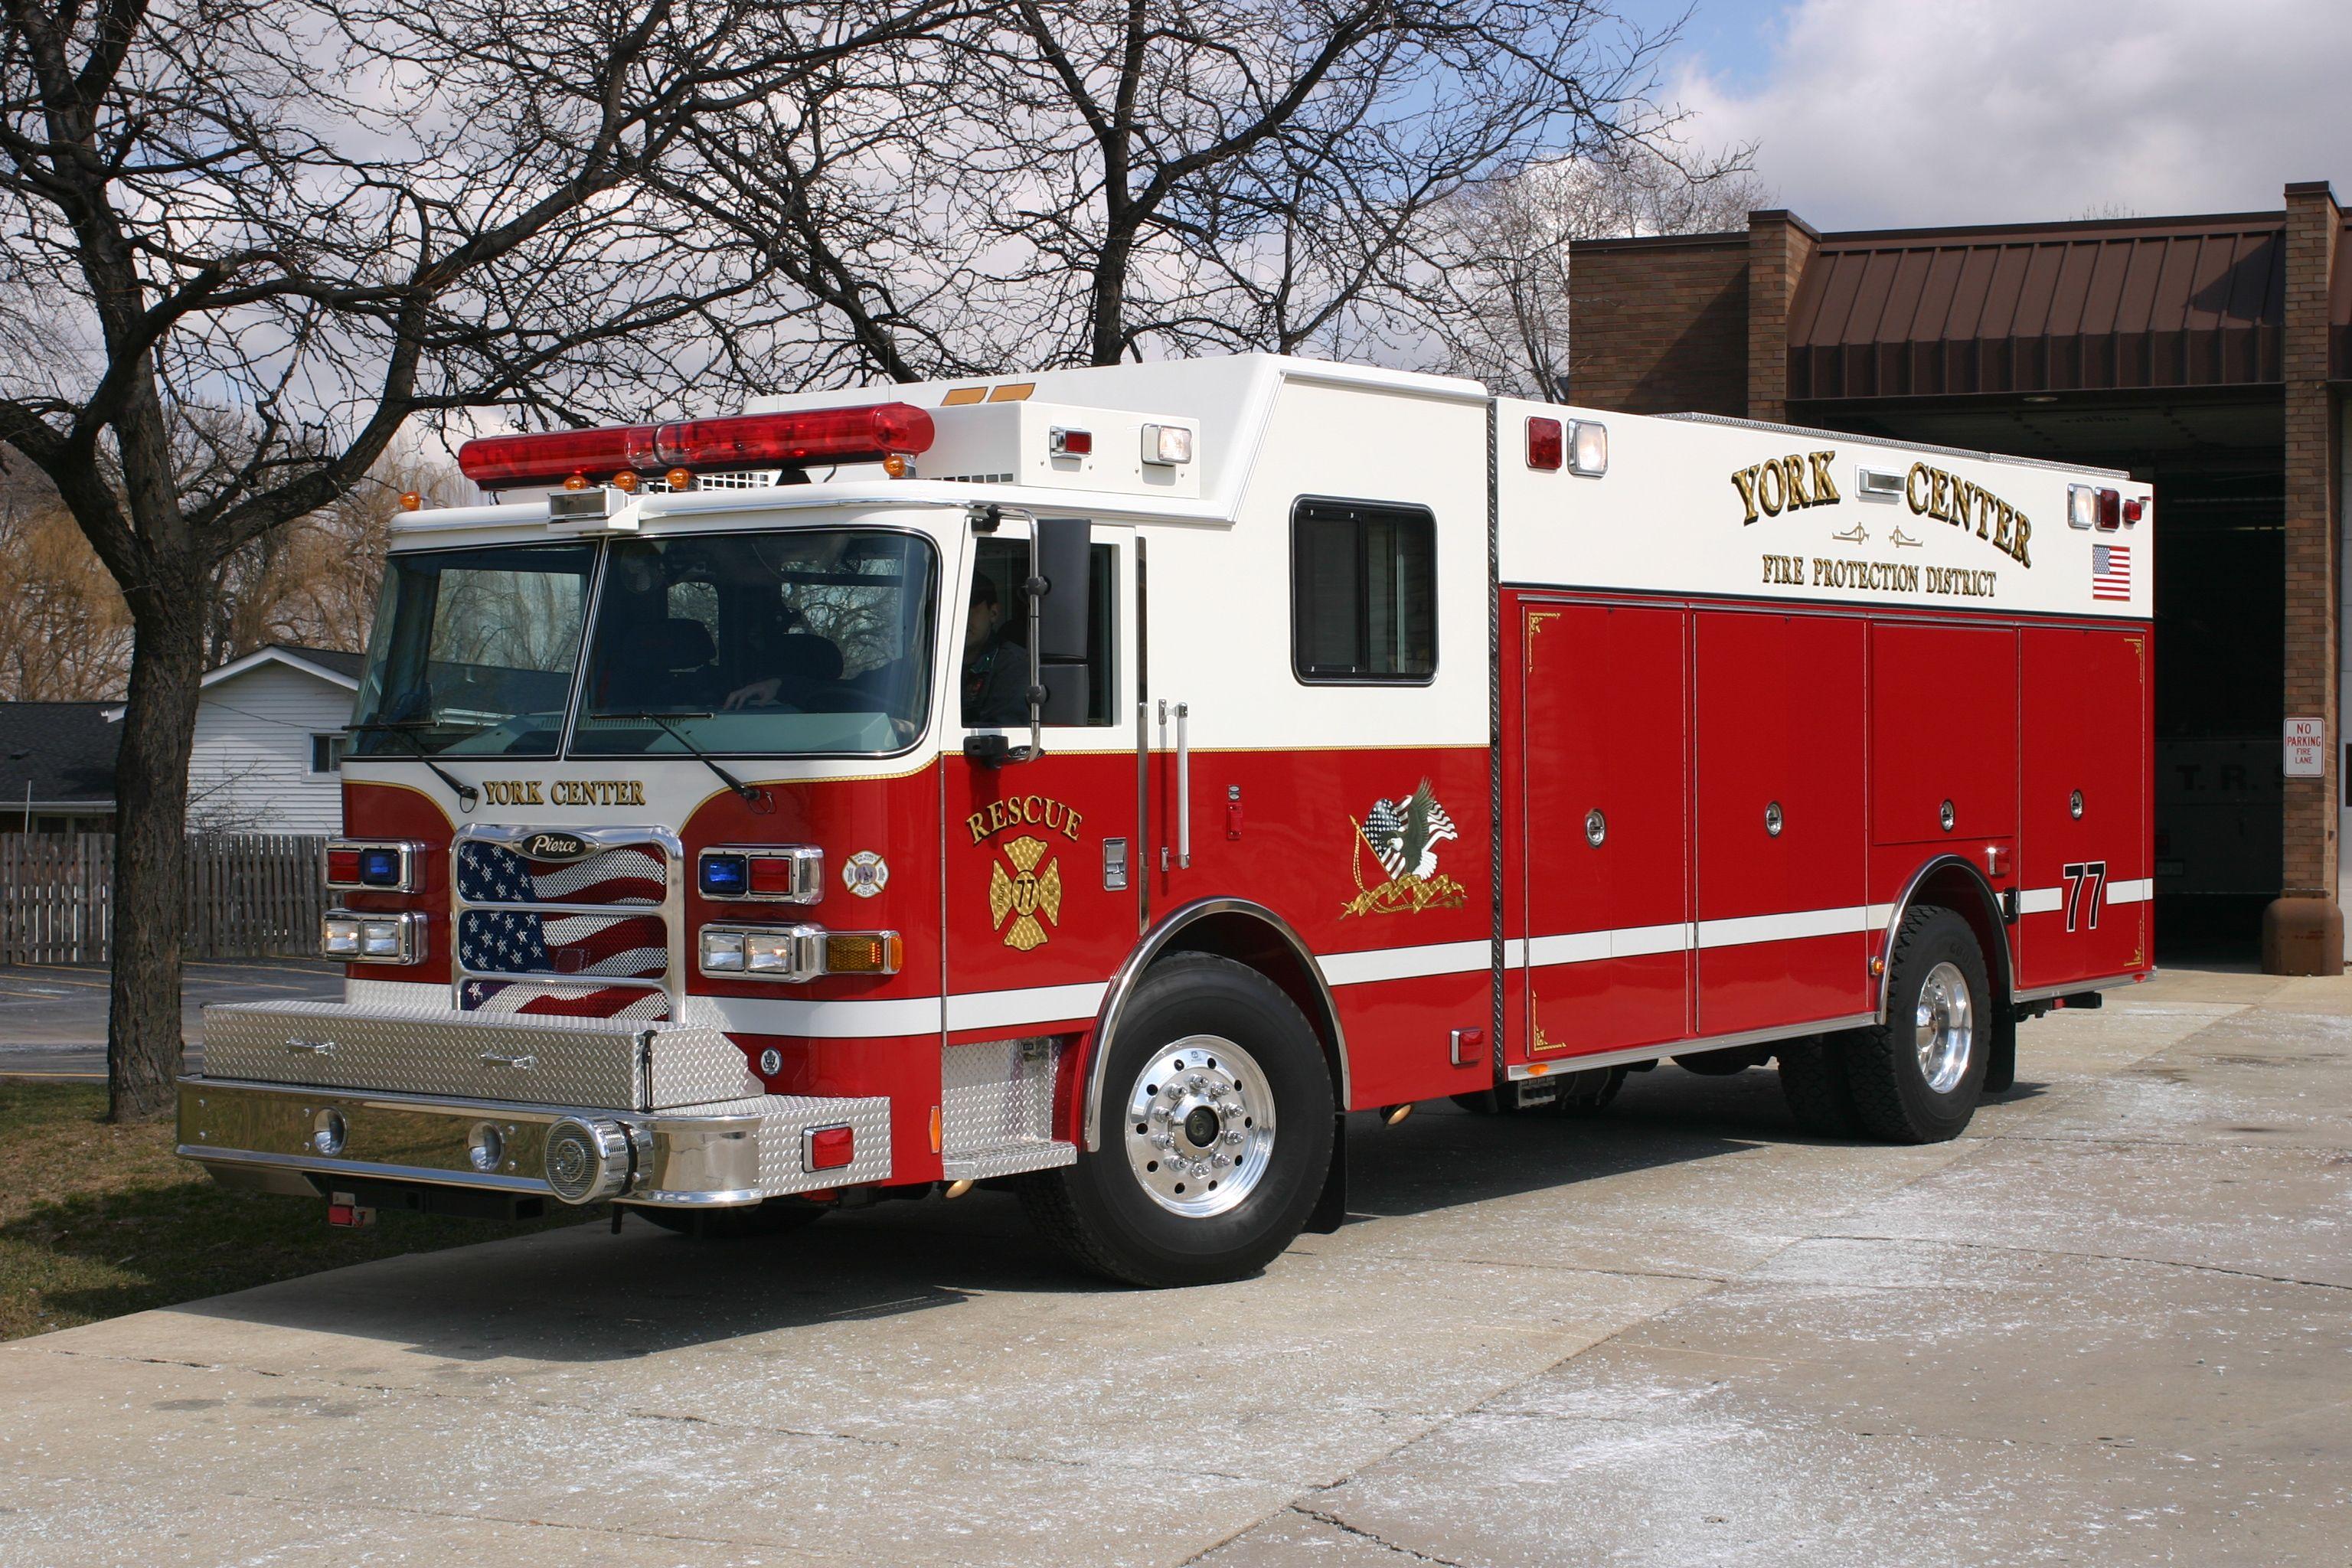 York Center Fire Protection District (IL) Squad 77 http://setcomcorp.com/922eintercom.html